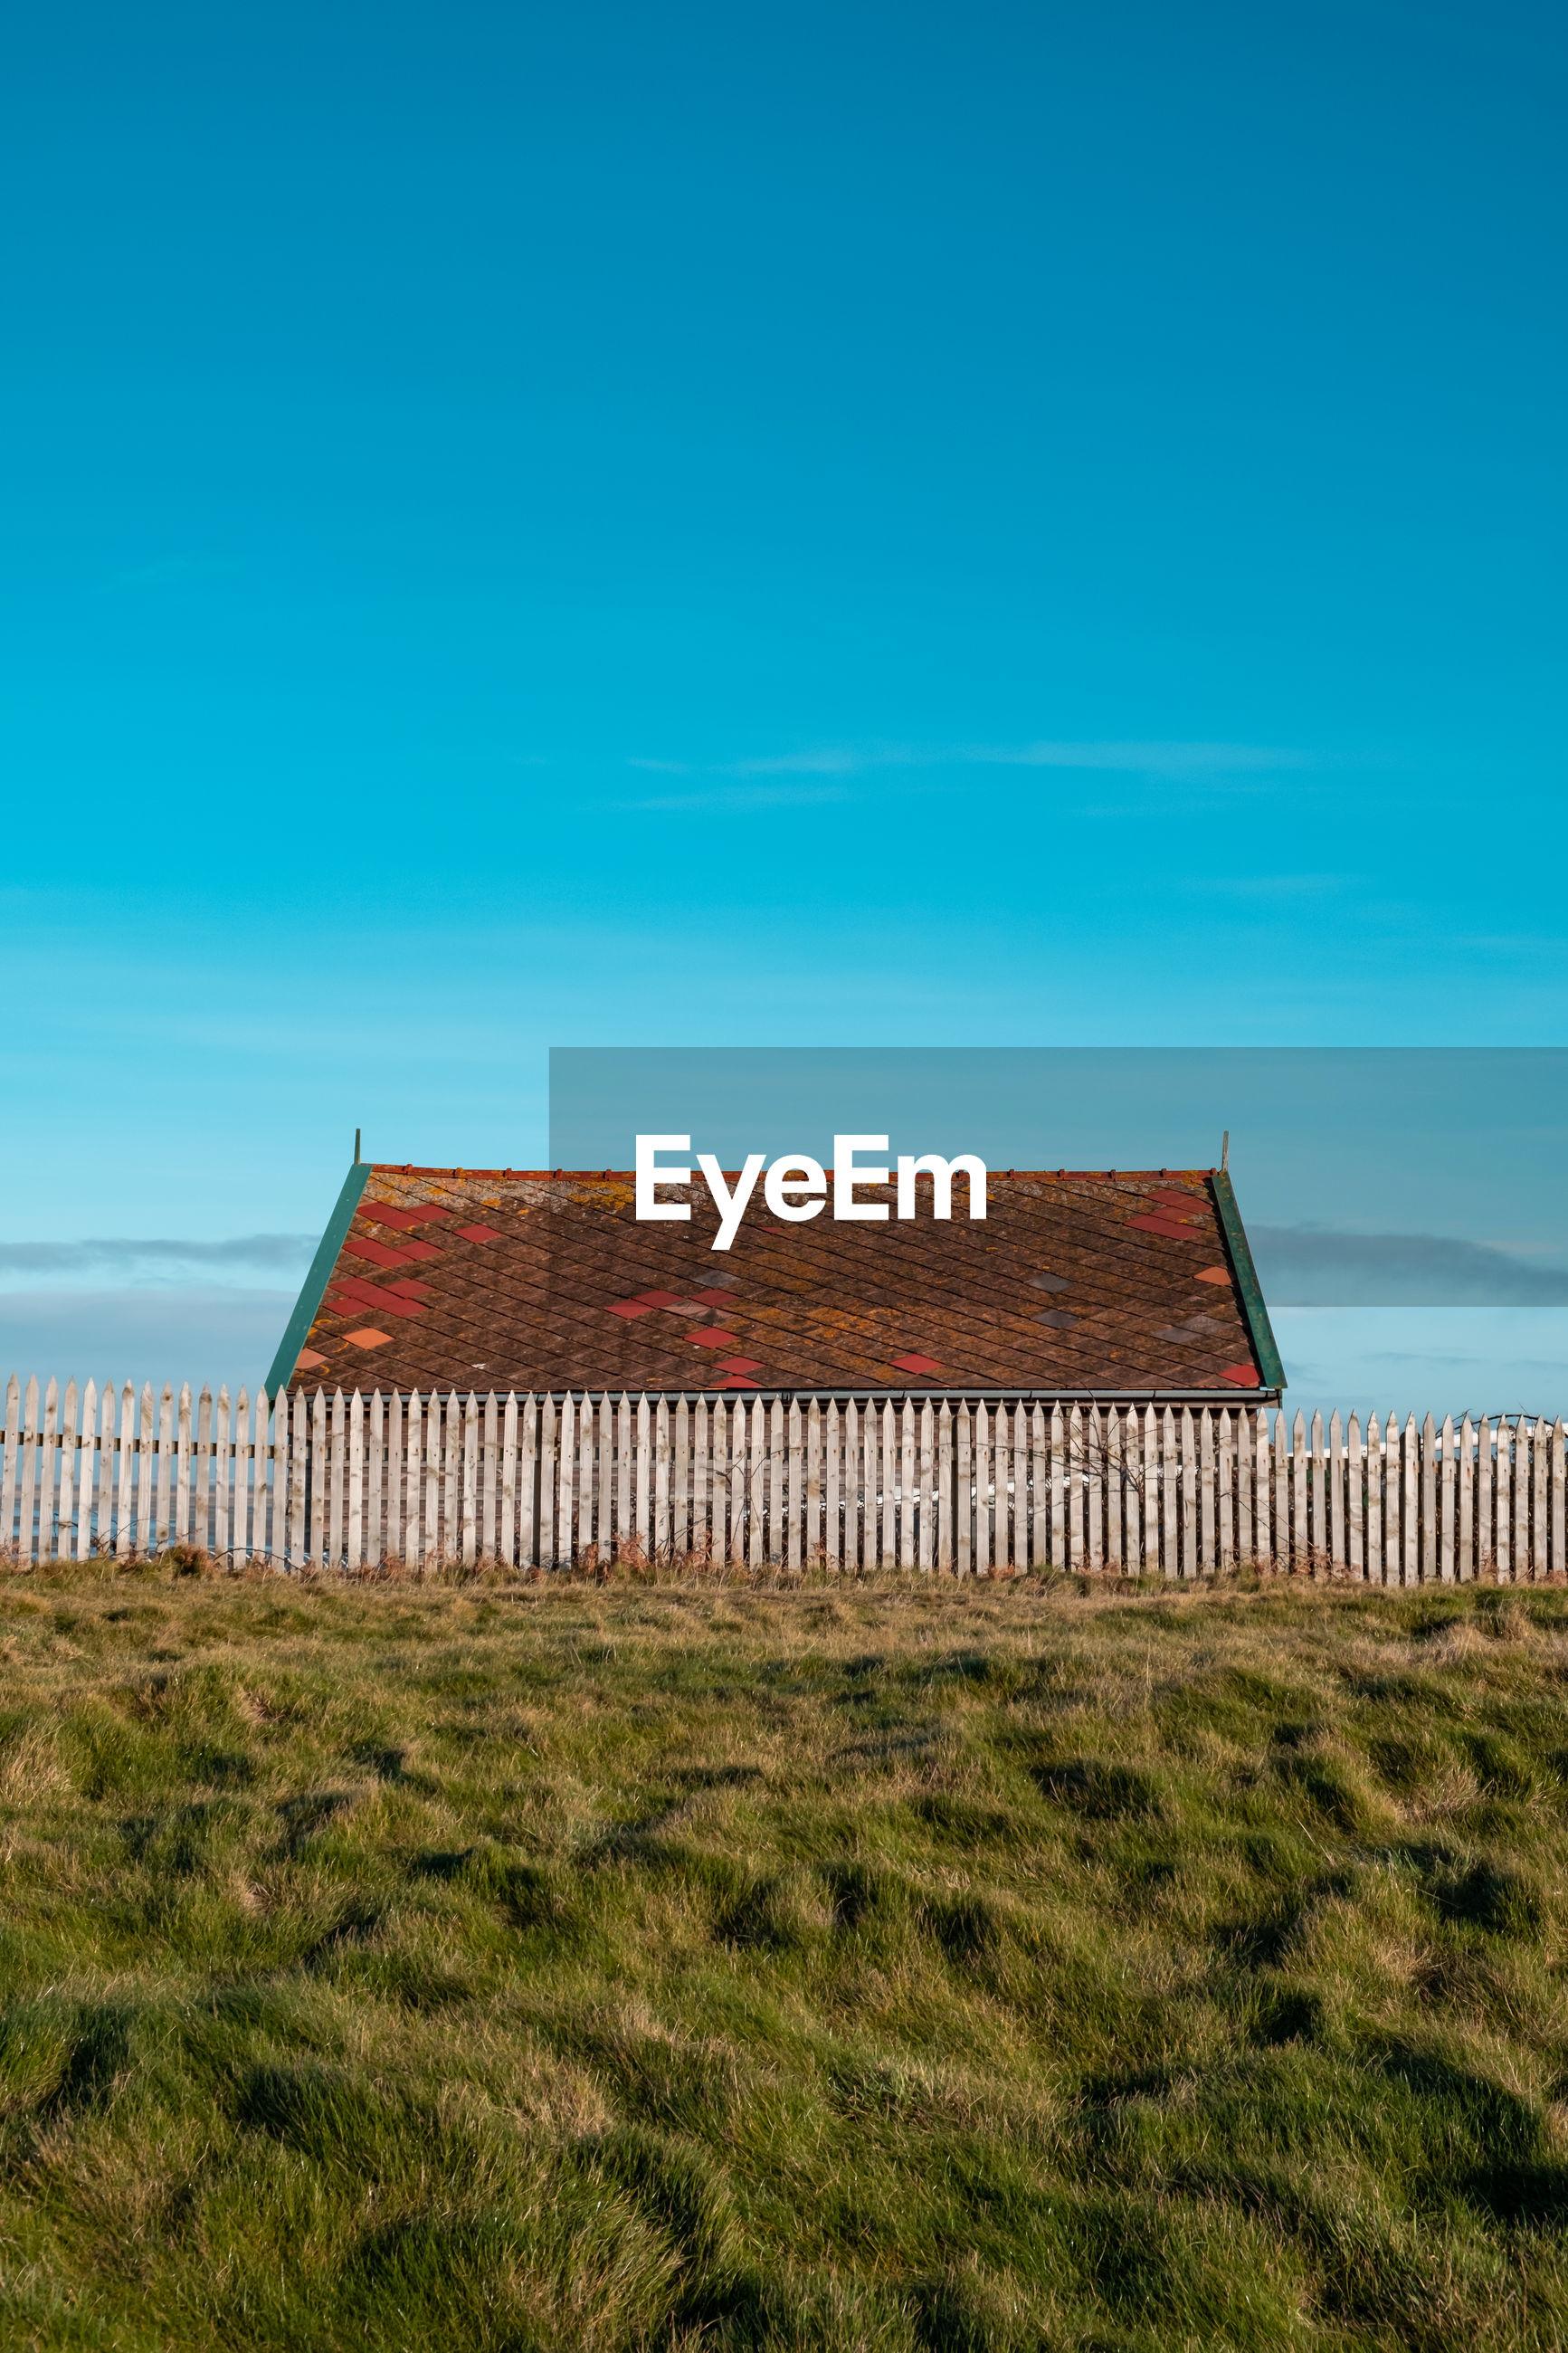 HOUSES ON FIELD AGAINST BLUE SKY